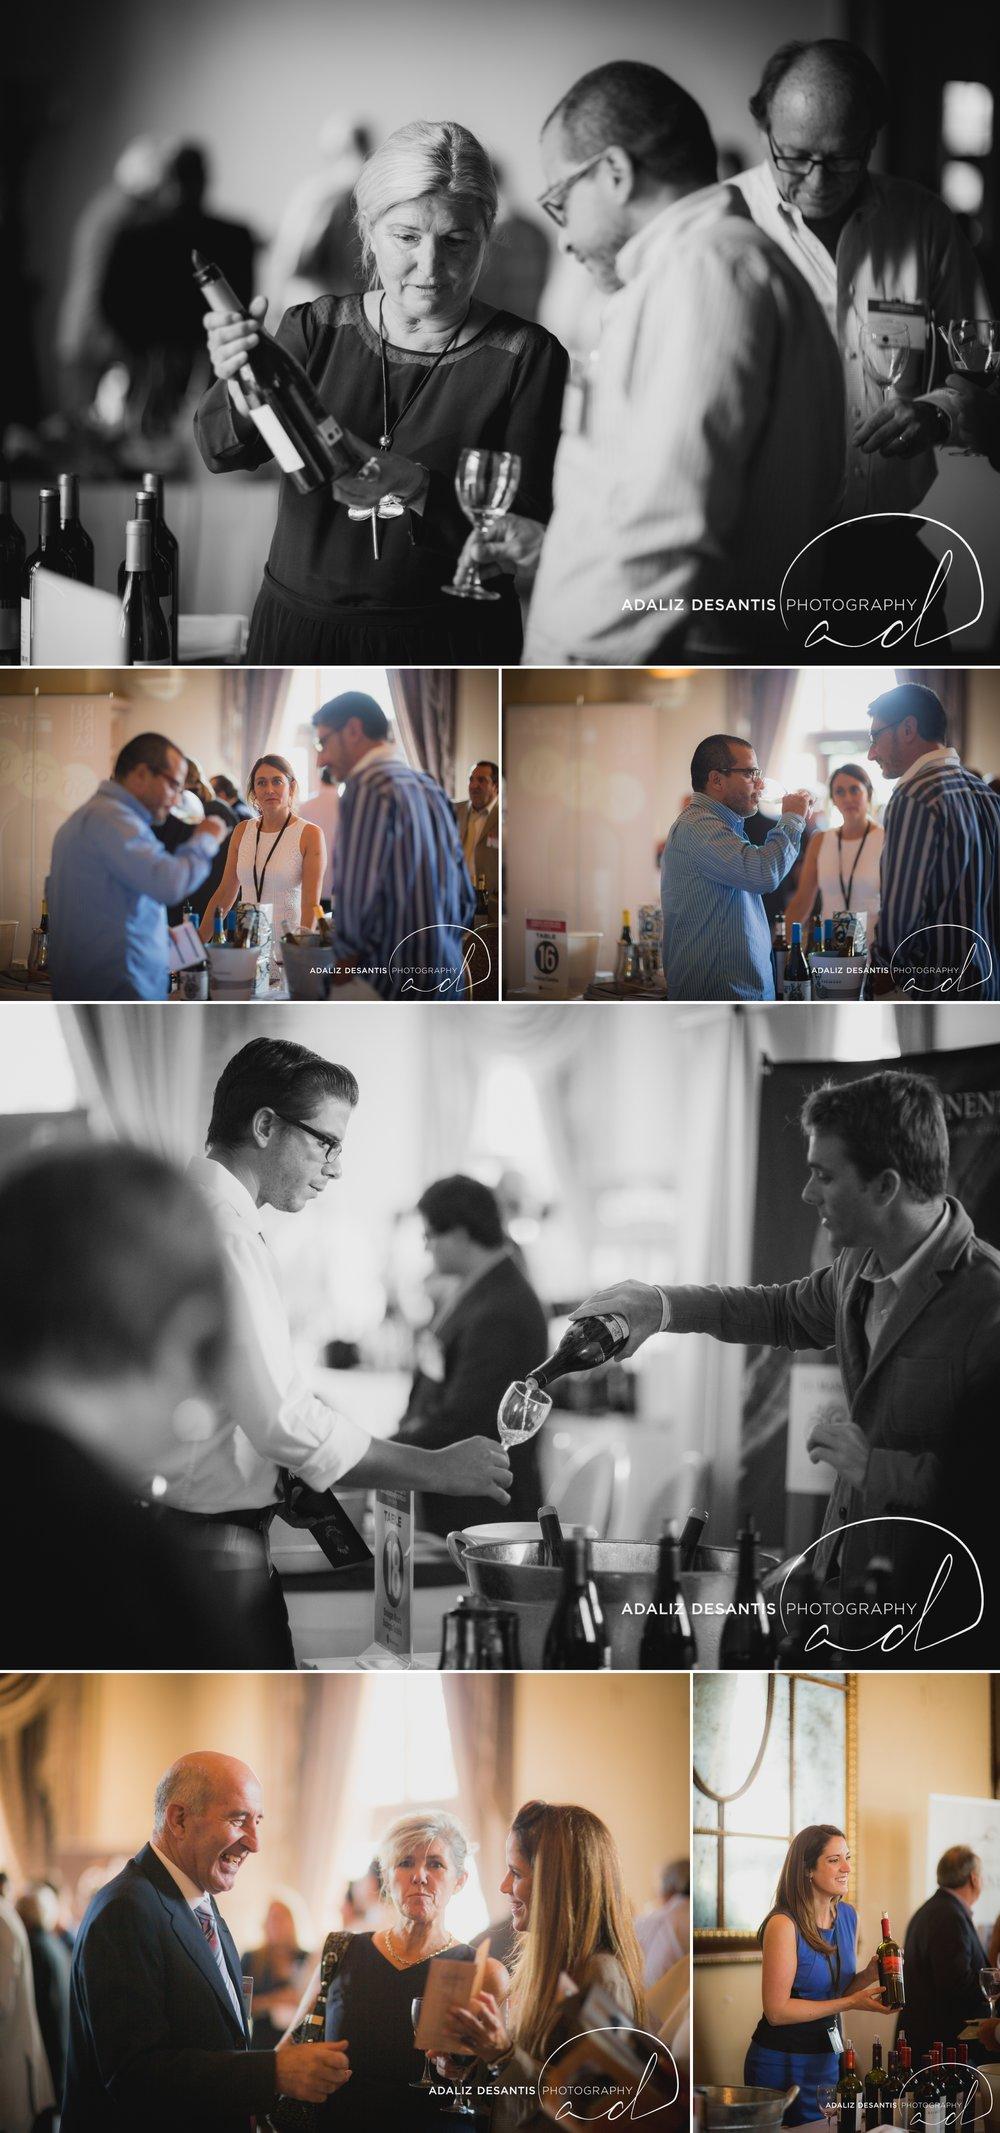 hidalgo imports anniversary wine spirits tasting biltmore hotel coral gables florida miami 7.jpg